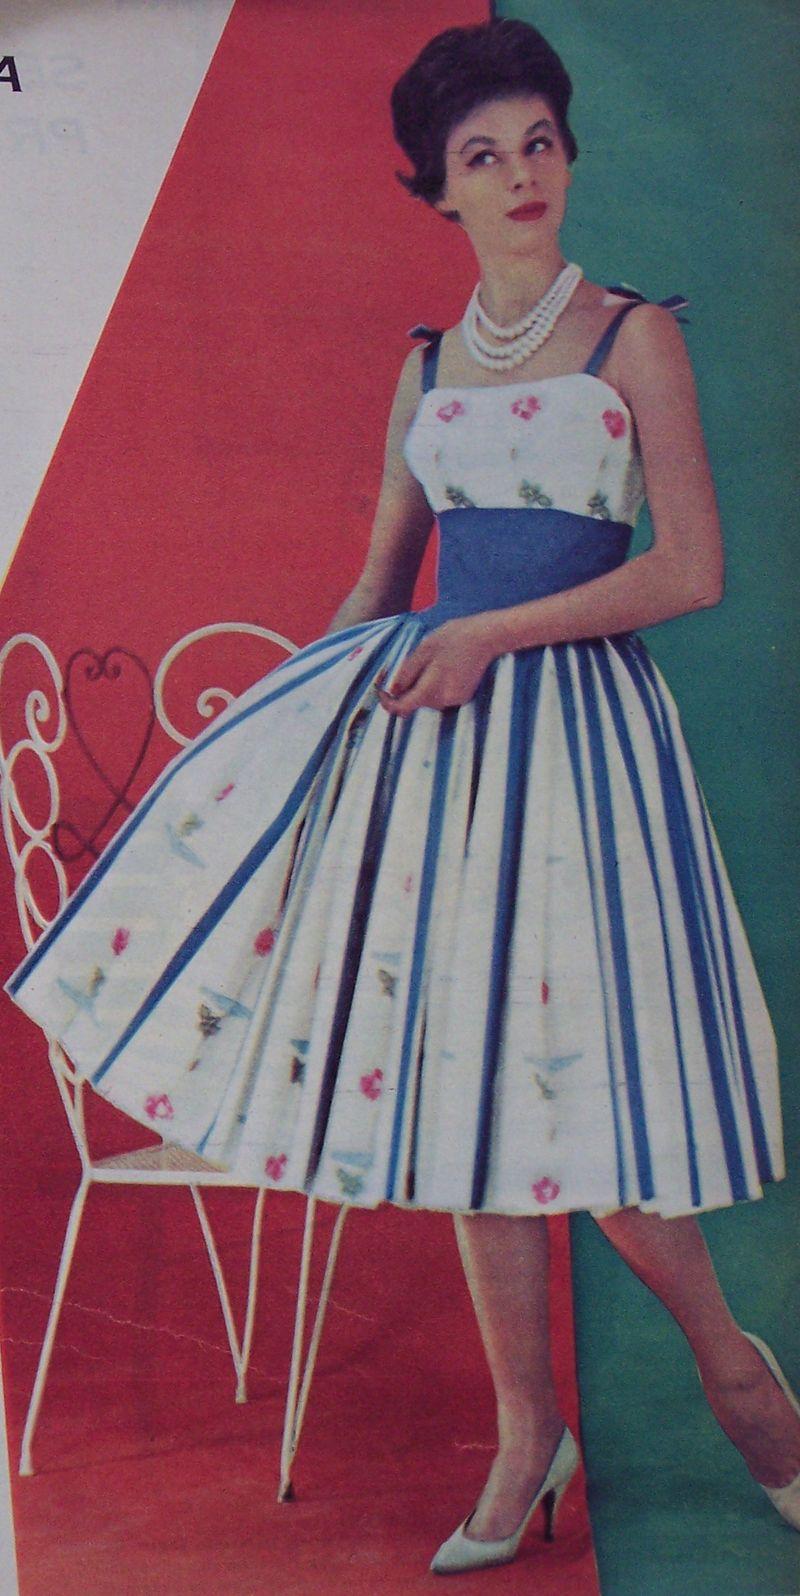 Grazia_Leger_1959_ArchiveABattista_Carosa